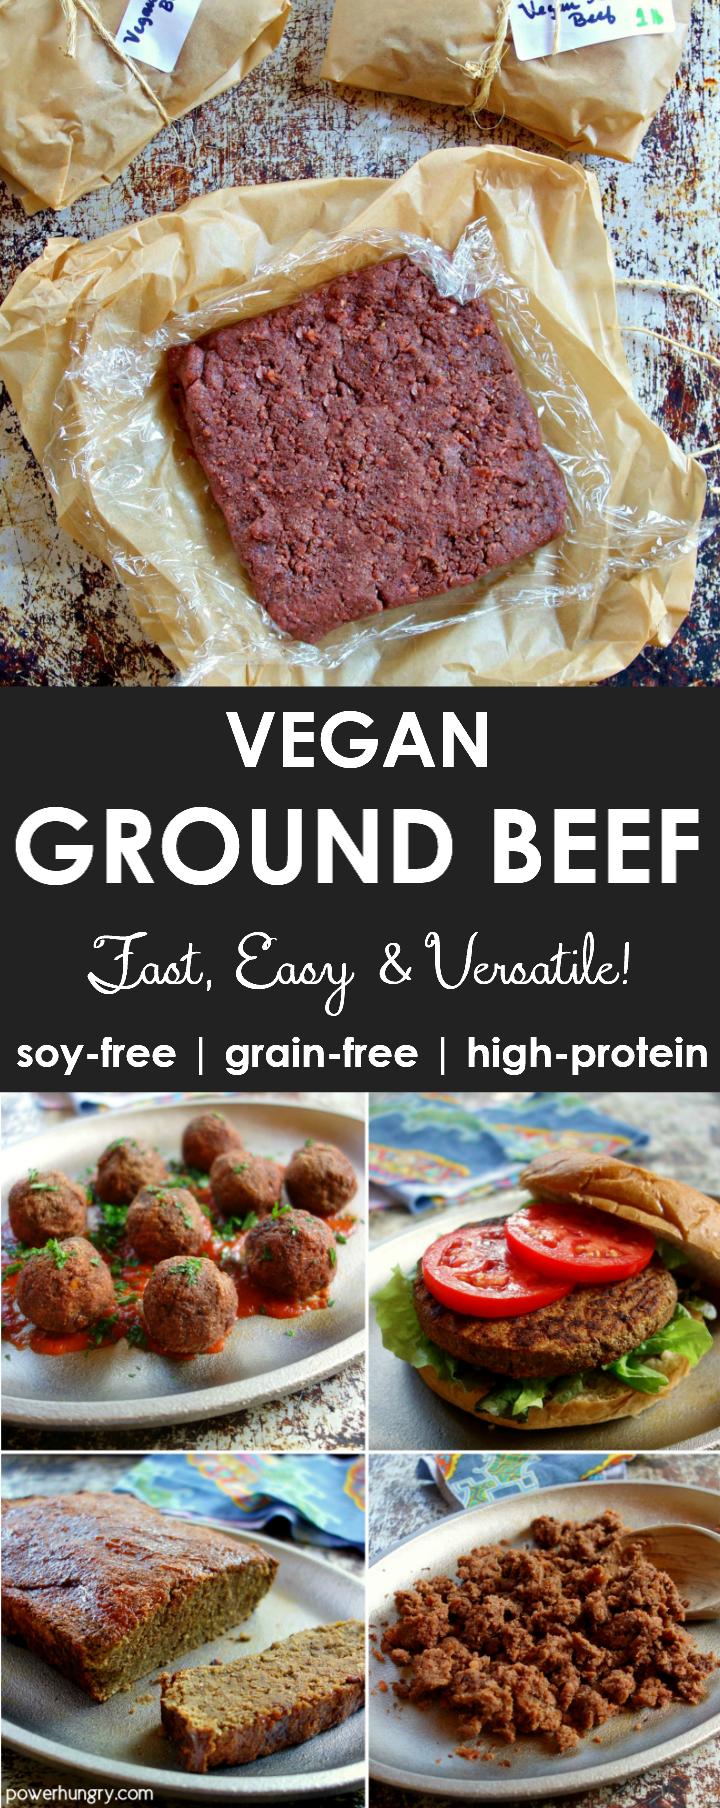 Vegan Ground Beef {soy-free, grain-free, high protein}